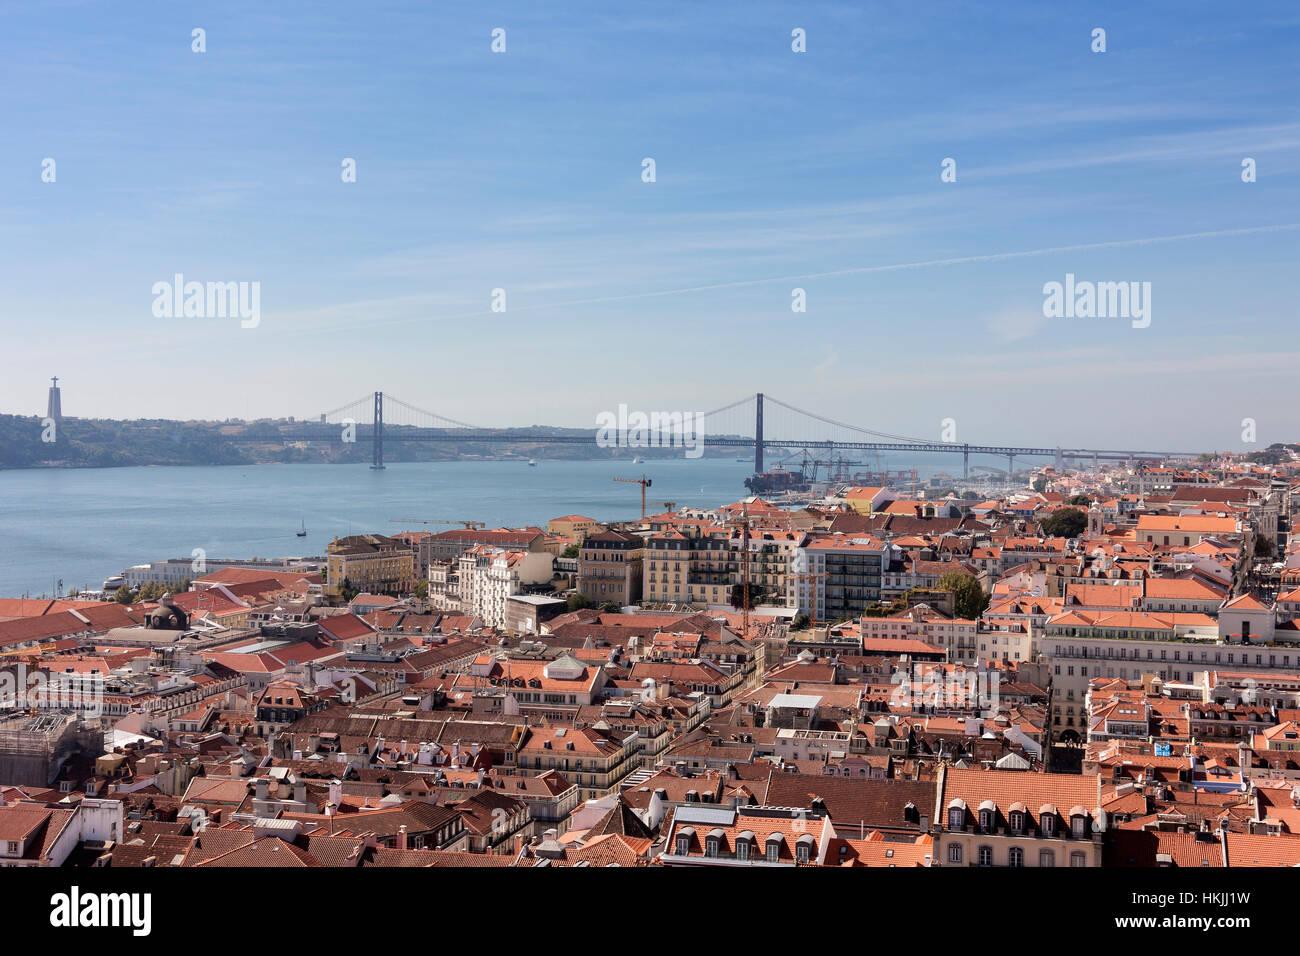 Aerial view of a city, April 25th Bridge, Lisbon, Portugal - Stock Image